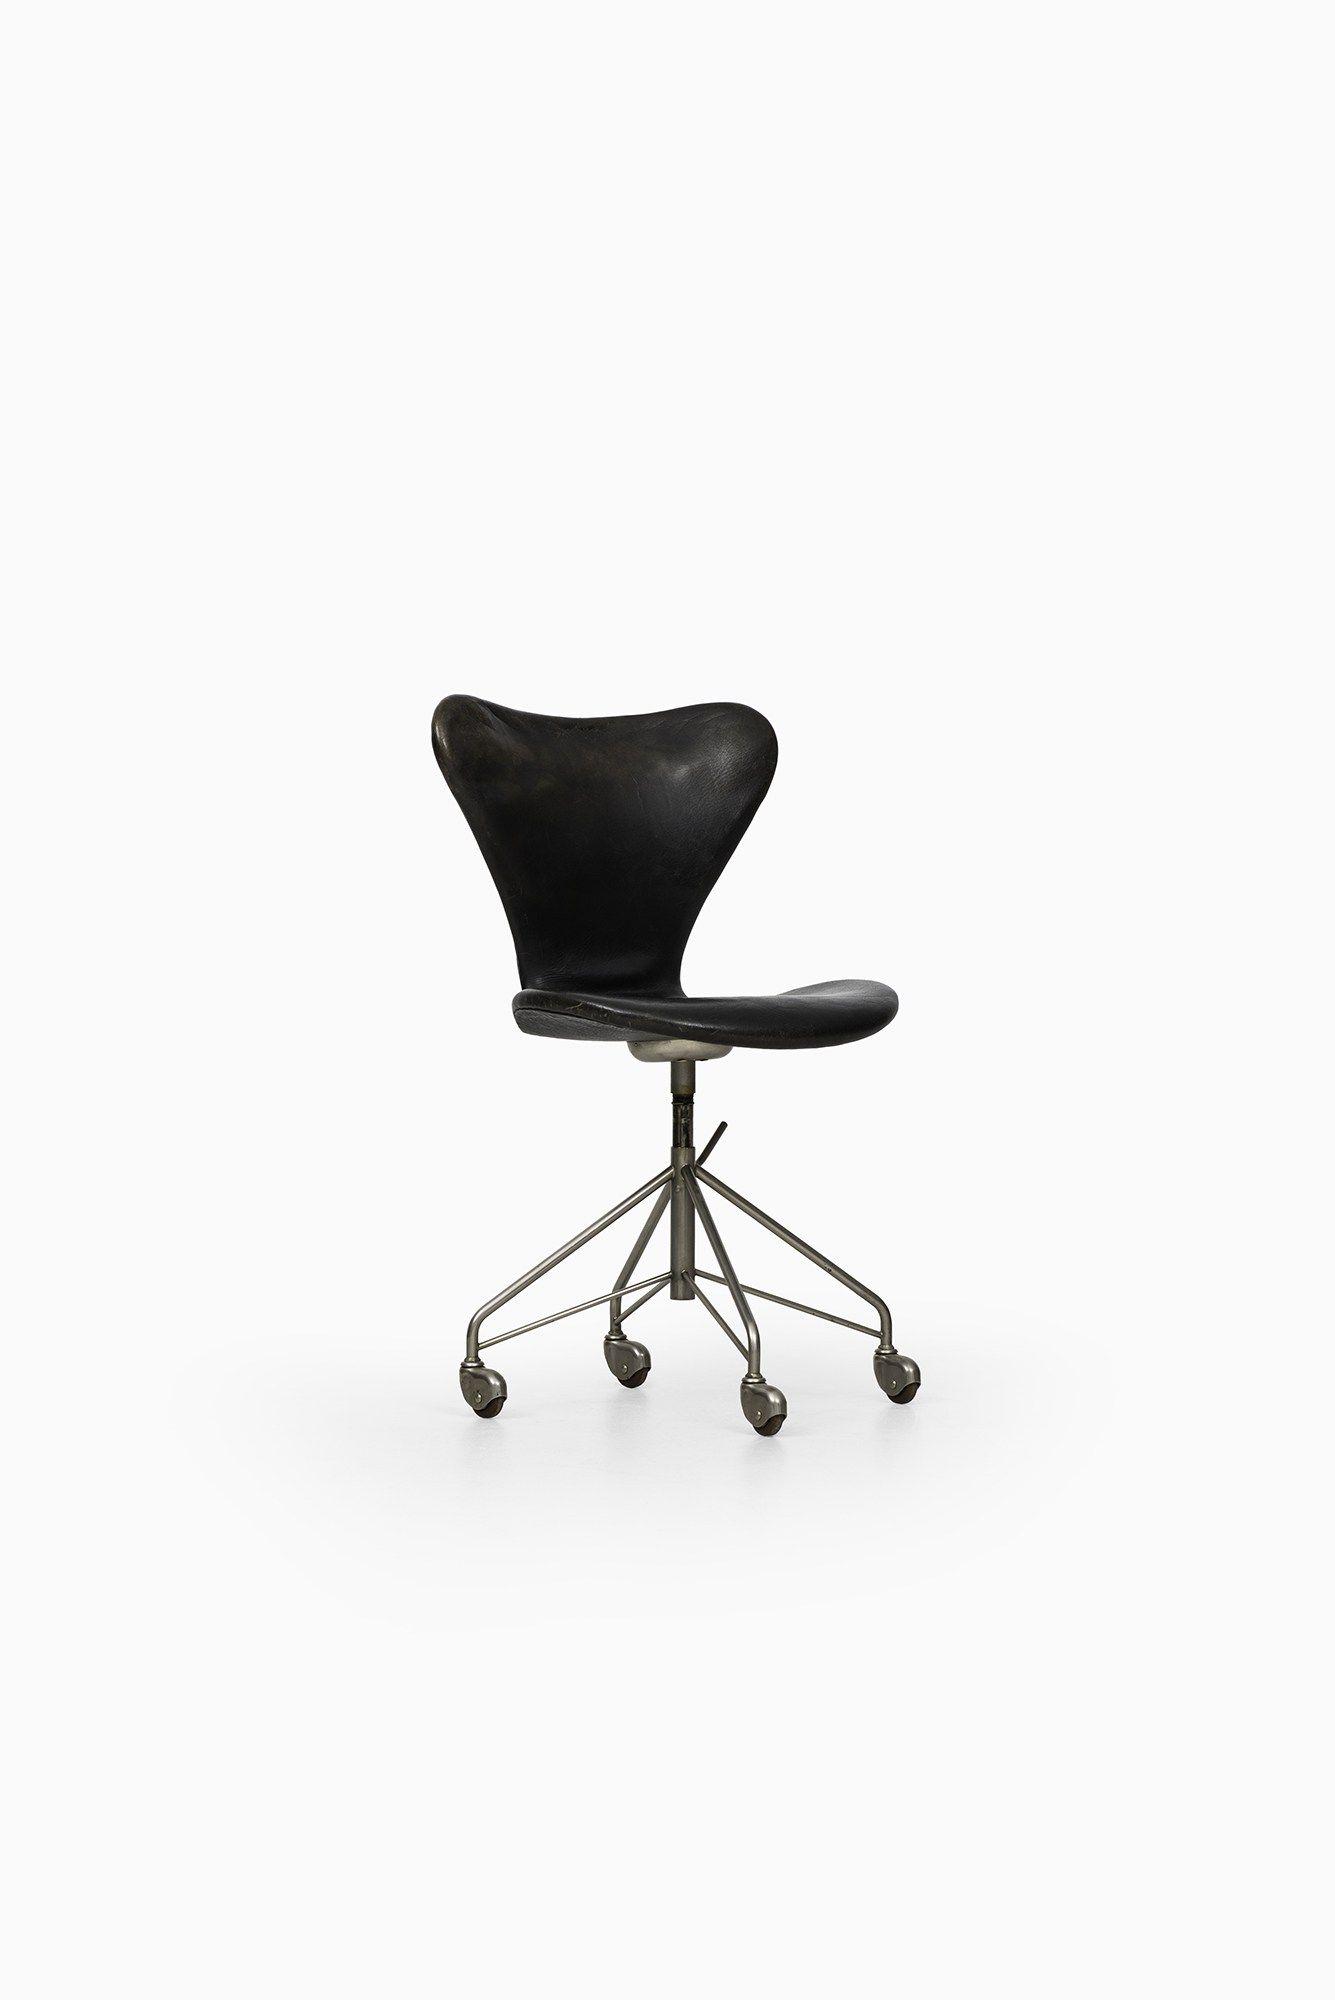 arne jacobsen office chair. Arne Jacobsen Office Chair Model 3117 At Studio Schalling N